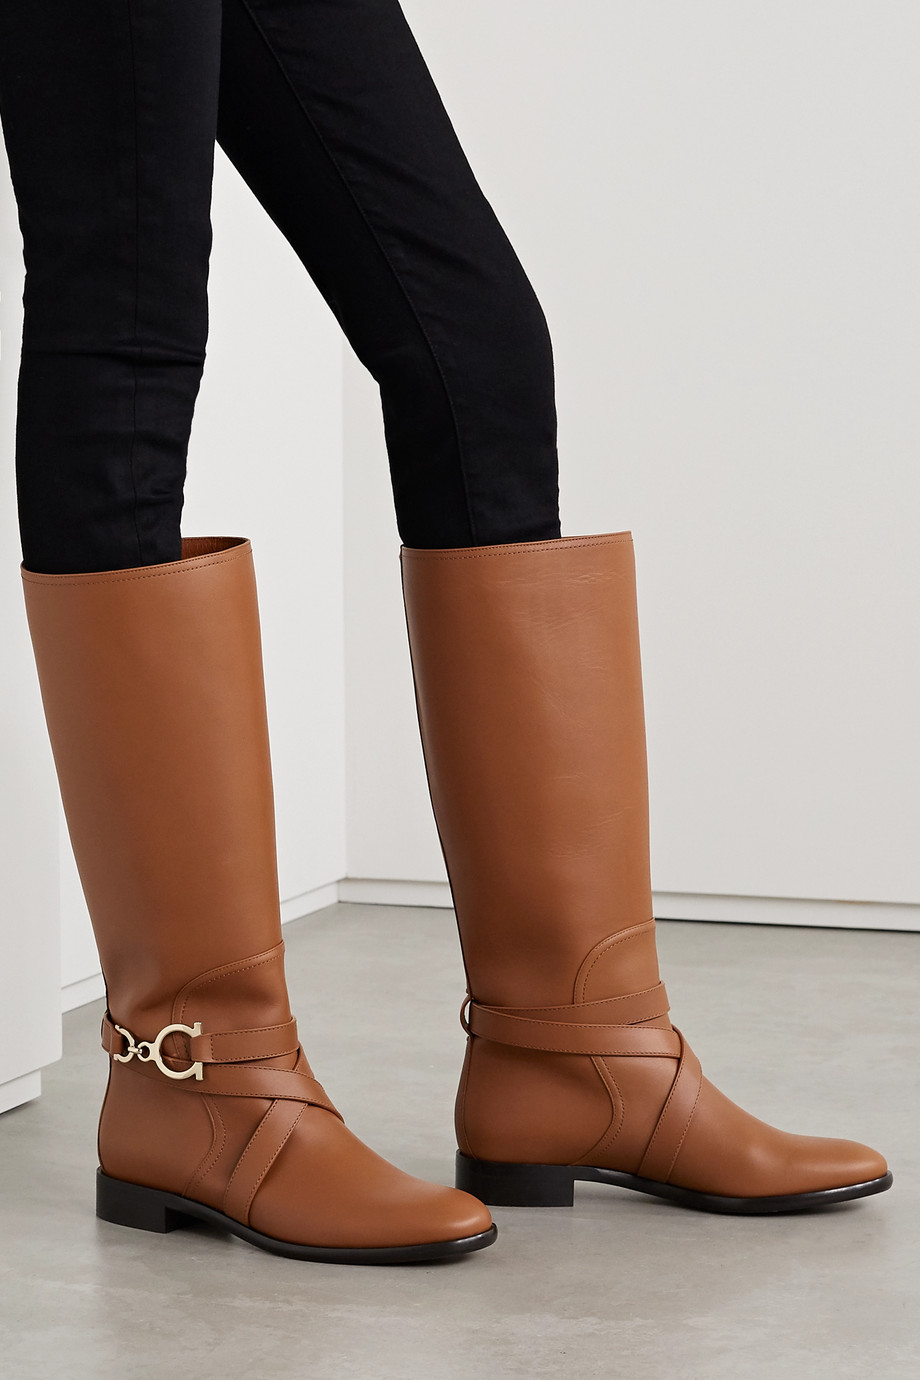 Salvatore Ferragamo Sara leather knee boots